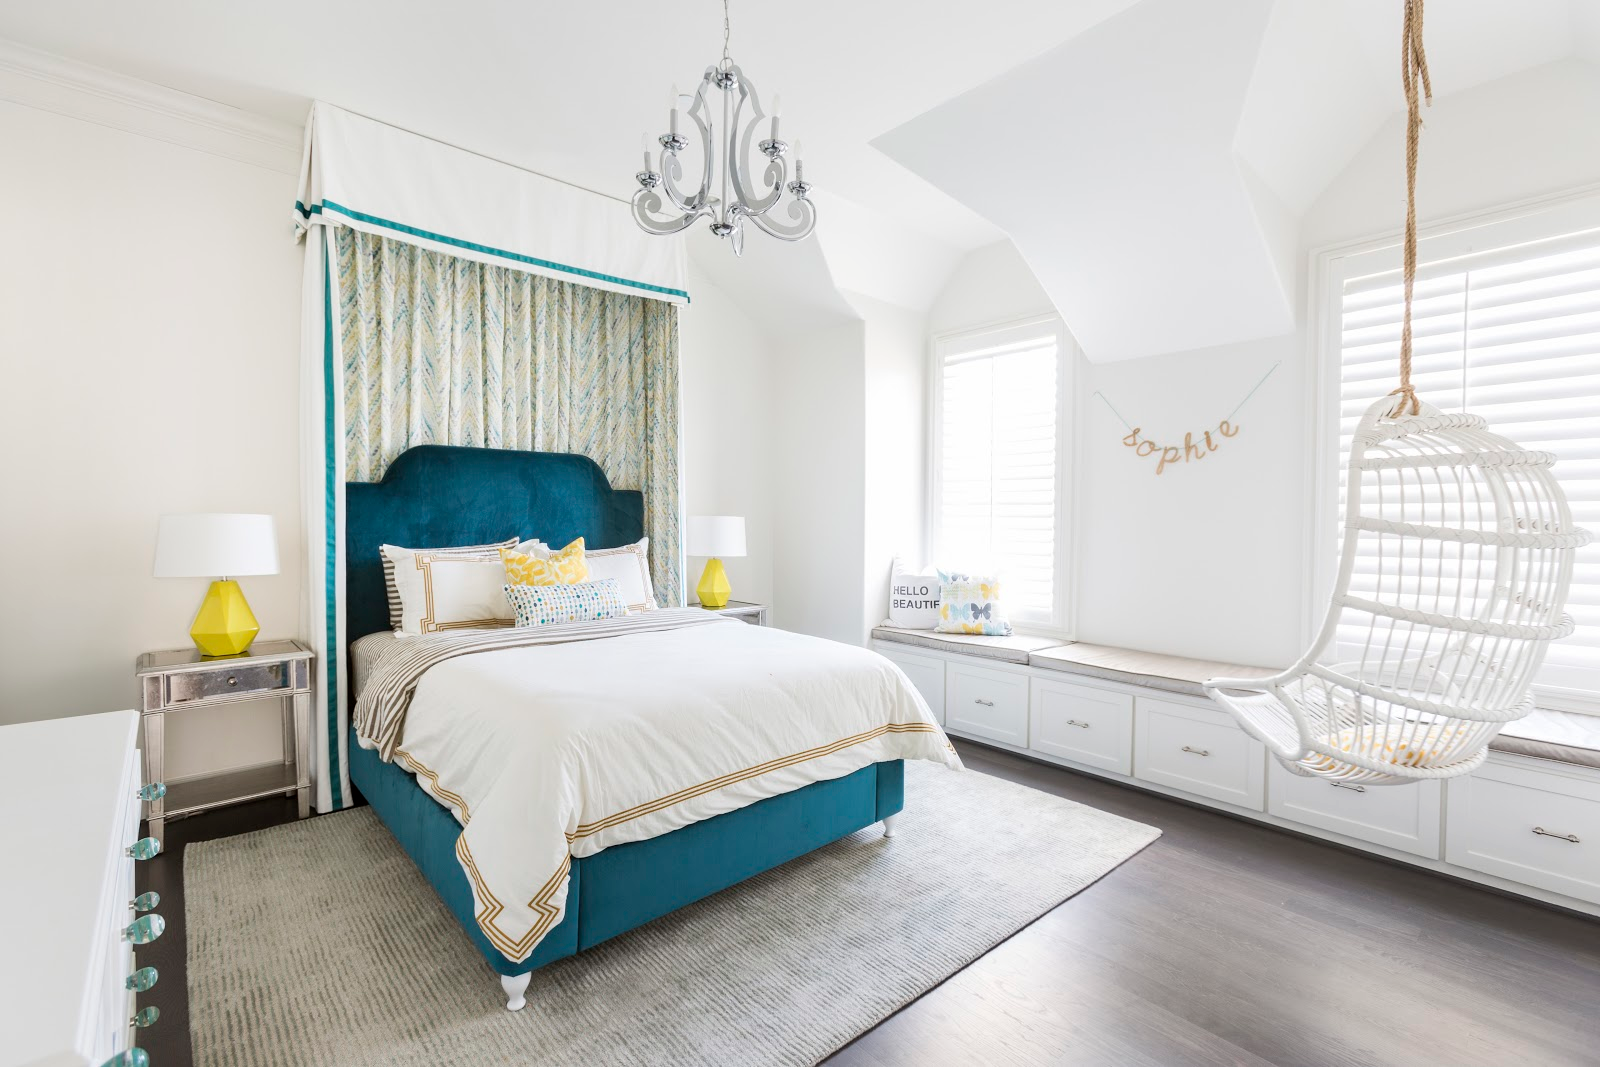 Teal velvet custom headboard in chic teenage bedroom with white hanging chair - laura u interior design